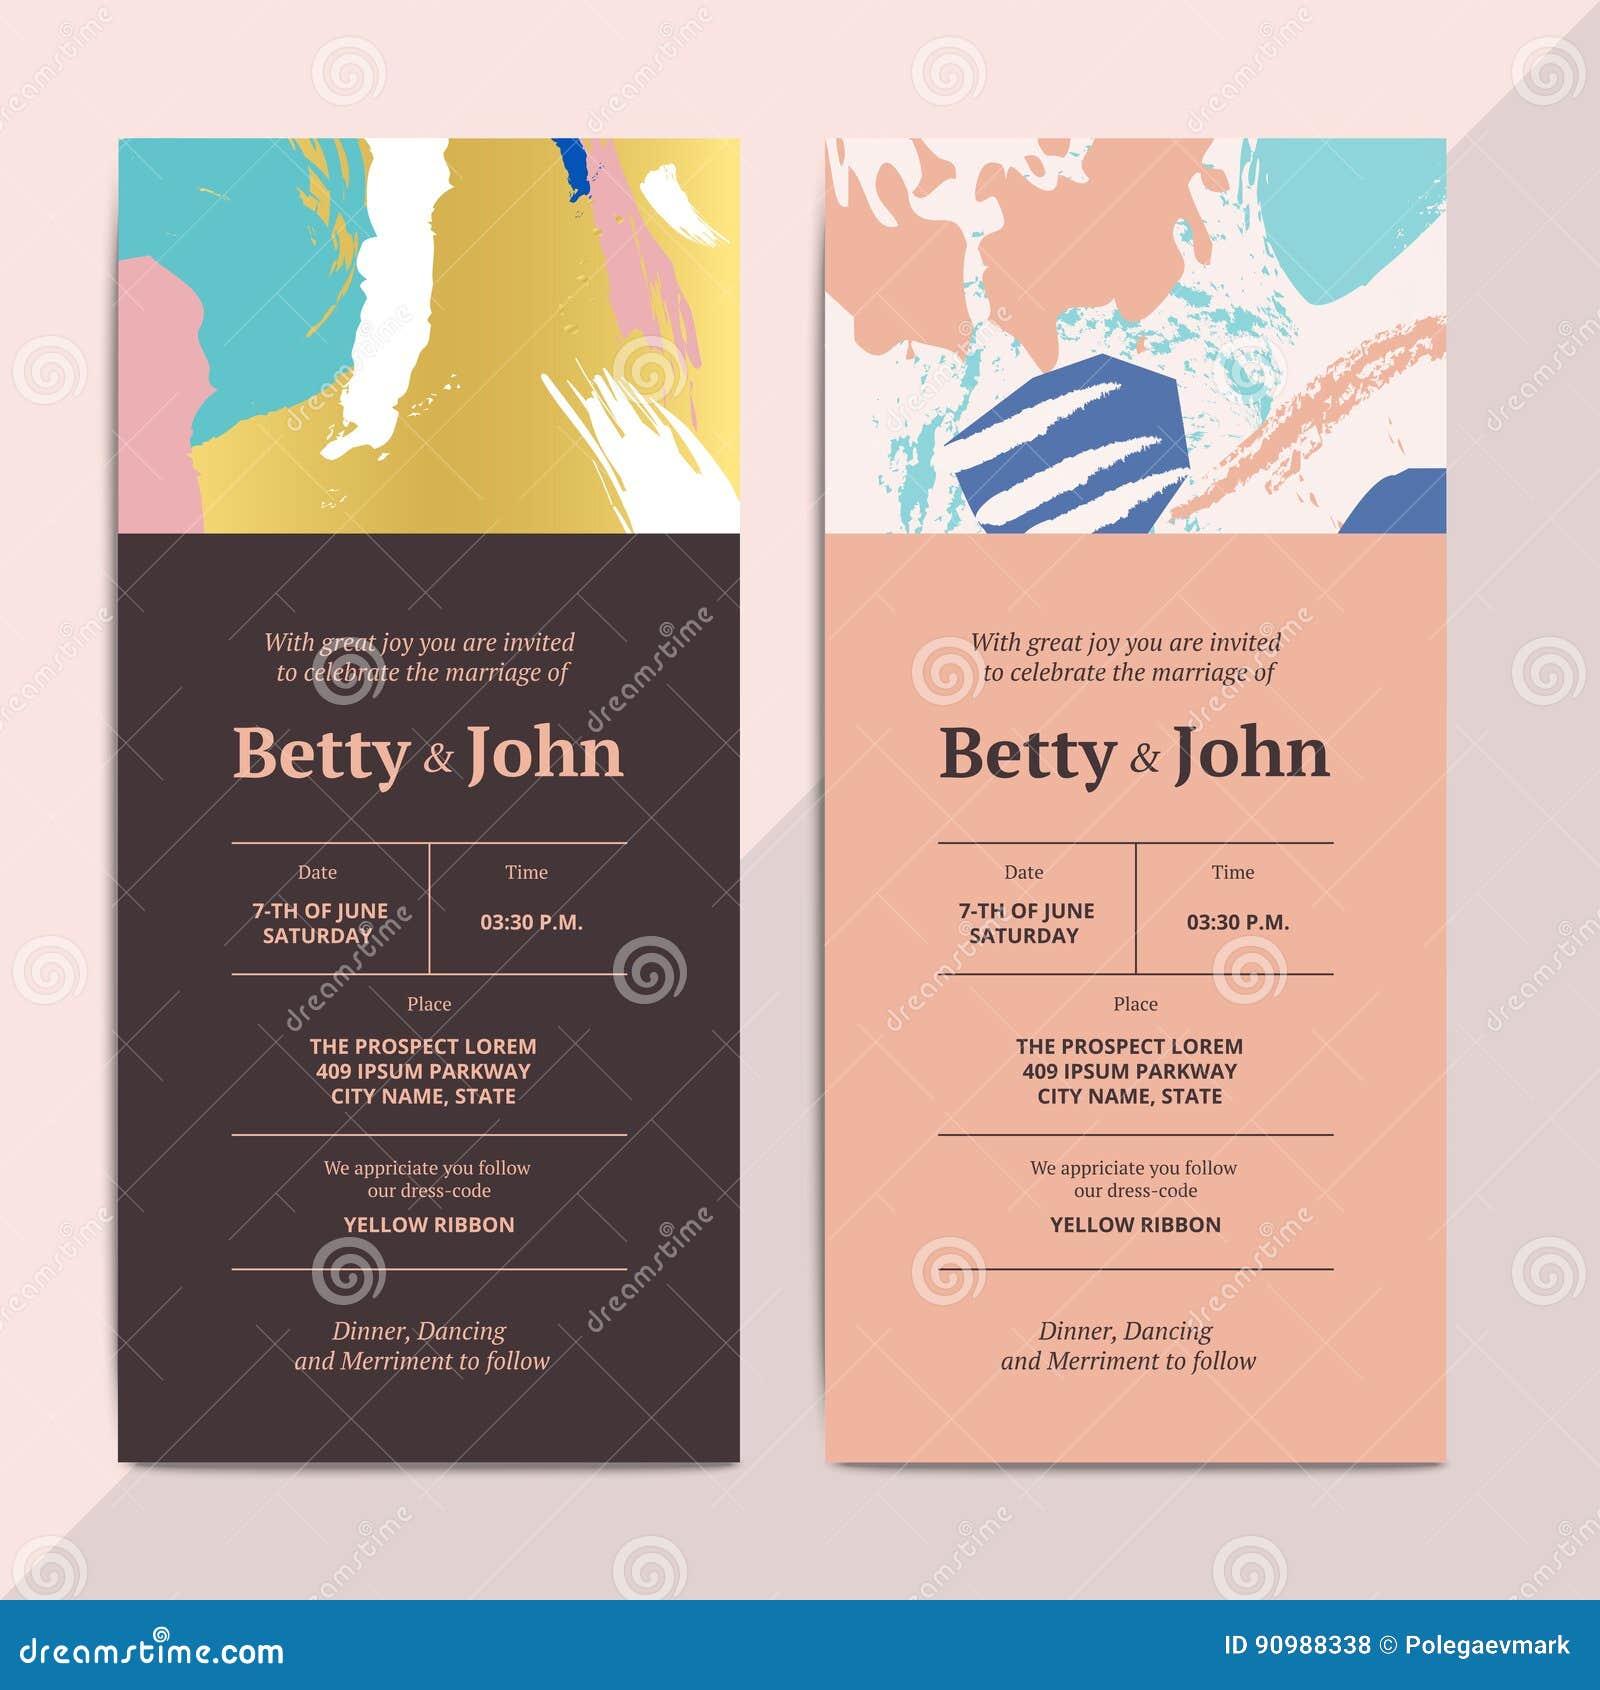 wedding invite layout templates